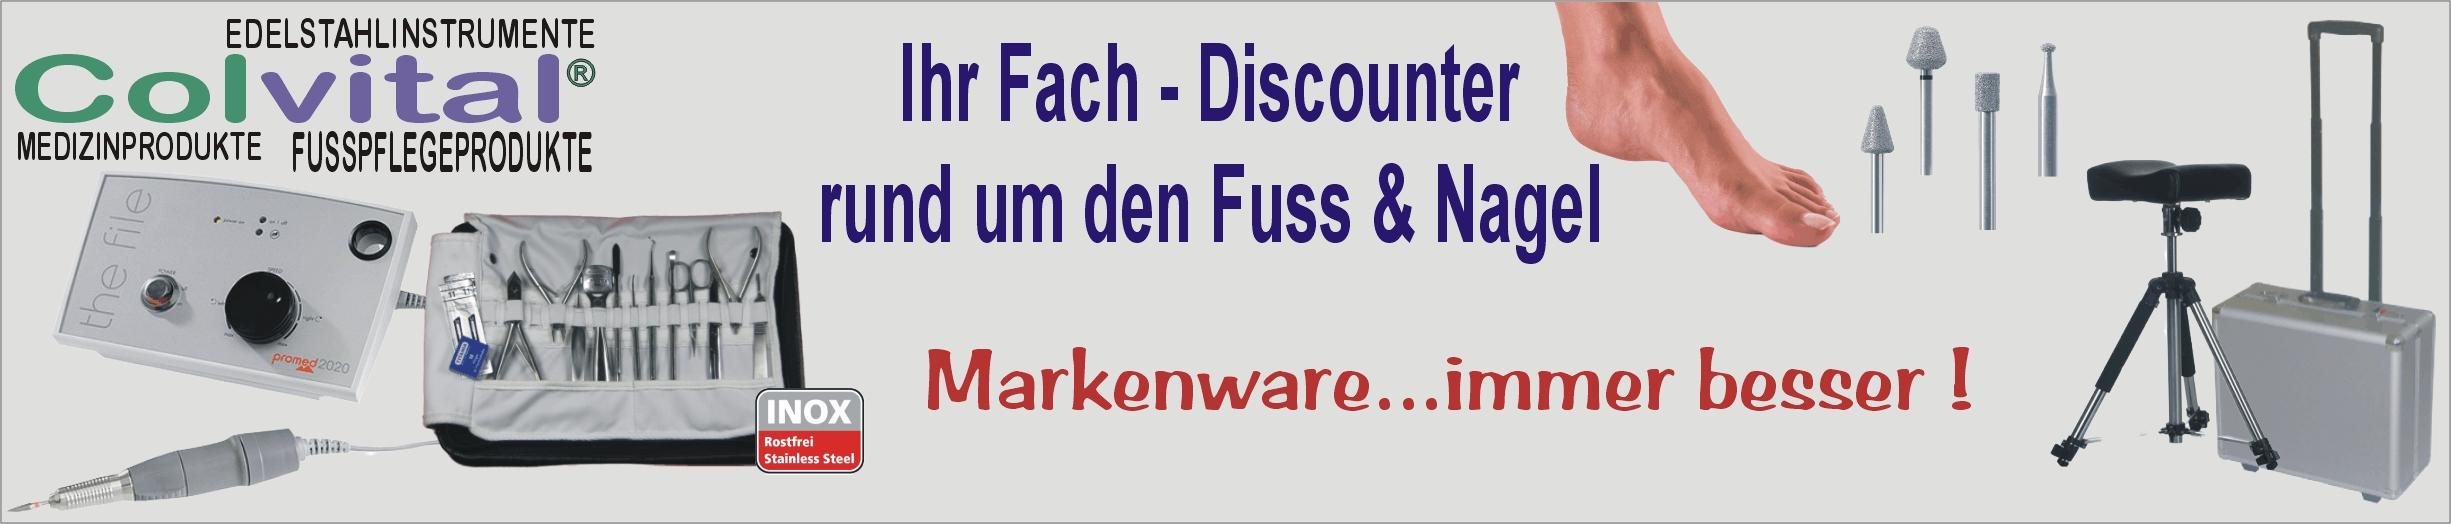 http://s205922281.online.de/produkte/Diverse/ebay%20kopf.jpg